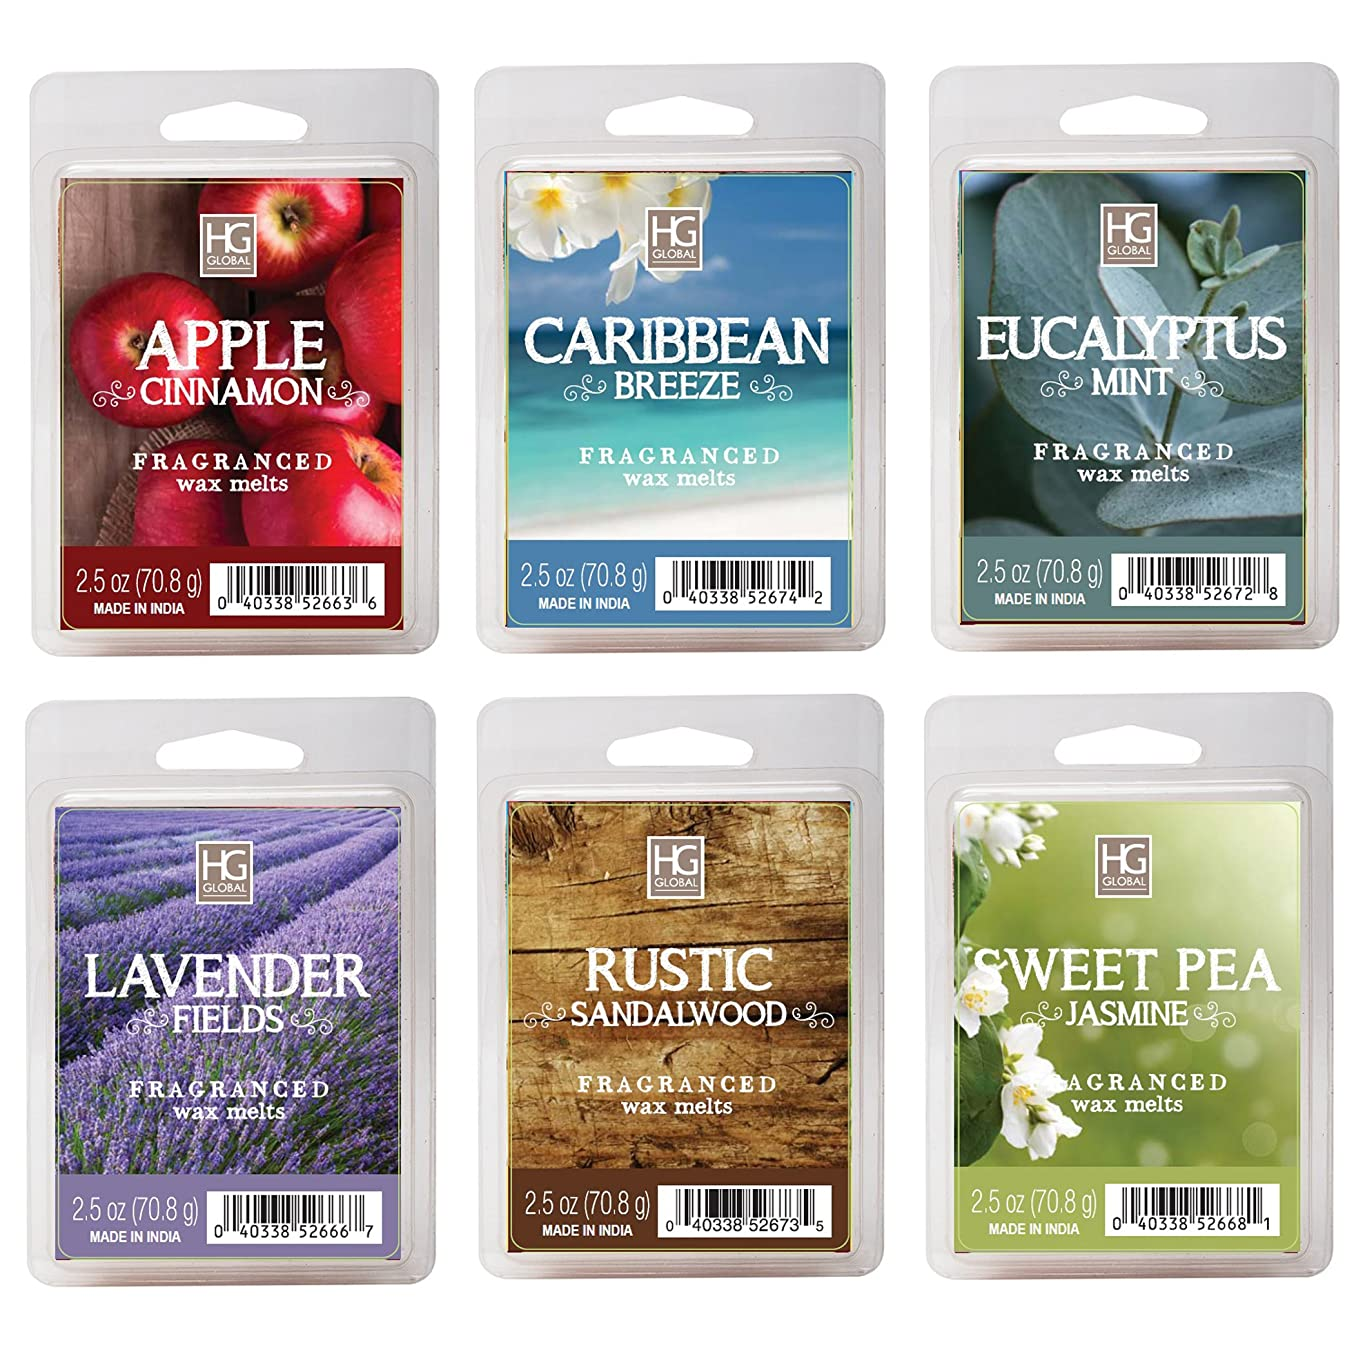 Hosley Set of 6 Assorted Wax Cubes / Melts / Tarts - 2.5 oz each. Apple Cinnamon, Caribbean Breeze, Eucalyptus Mint, Lavender Fields, Rustic Sandalwood, Sweet Pea Jasmine. Ideal GIFT